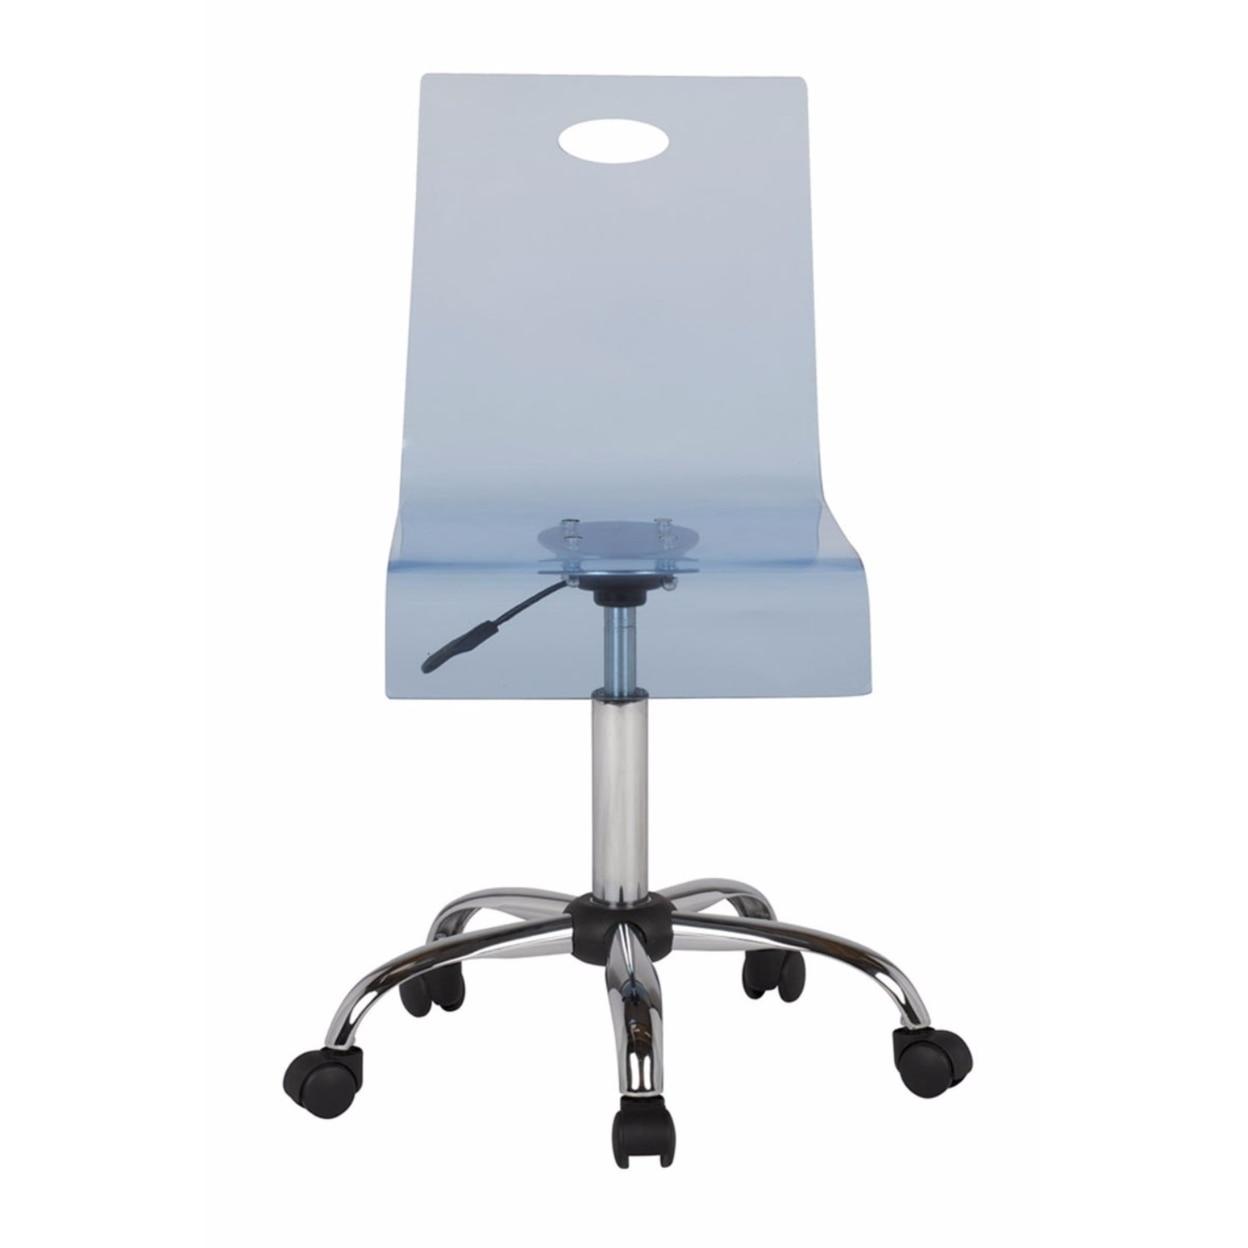 Offex Home Office Lucent Task Chair - Chrome/Indigo Blue